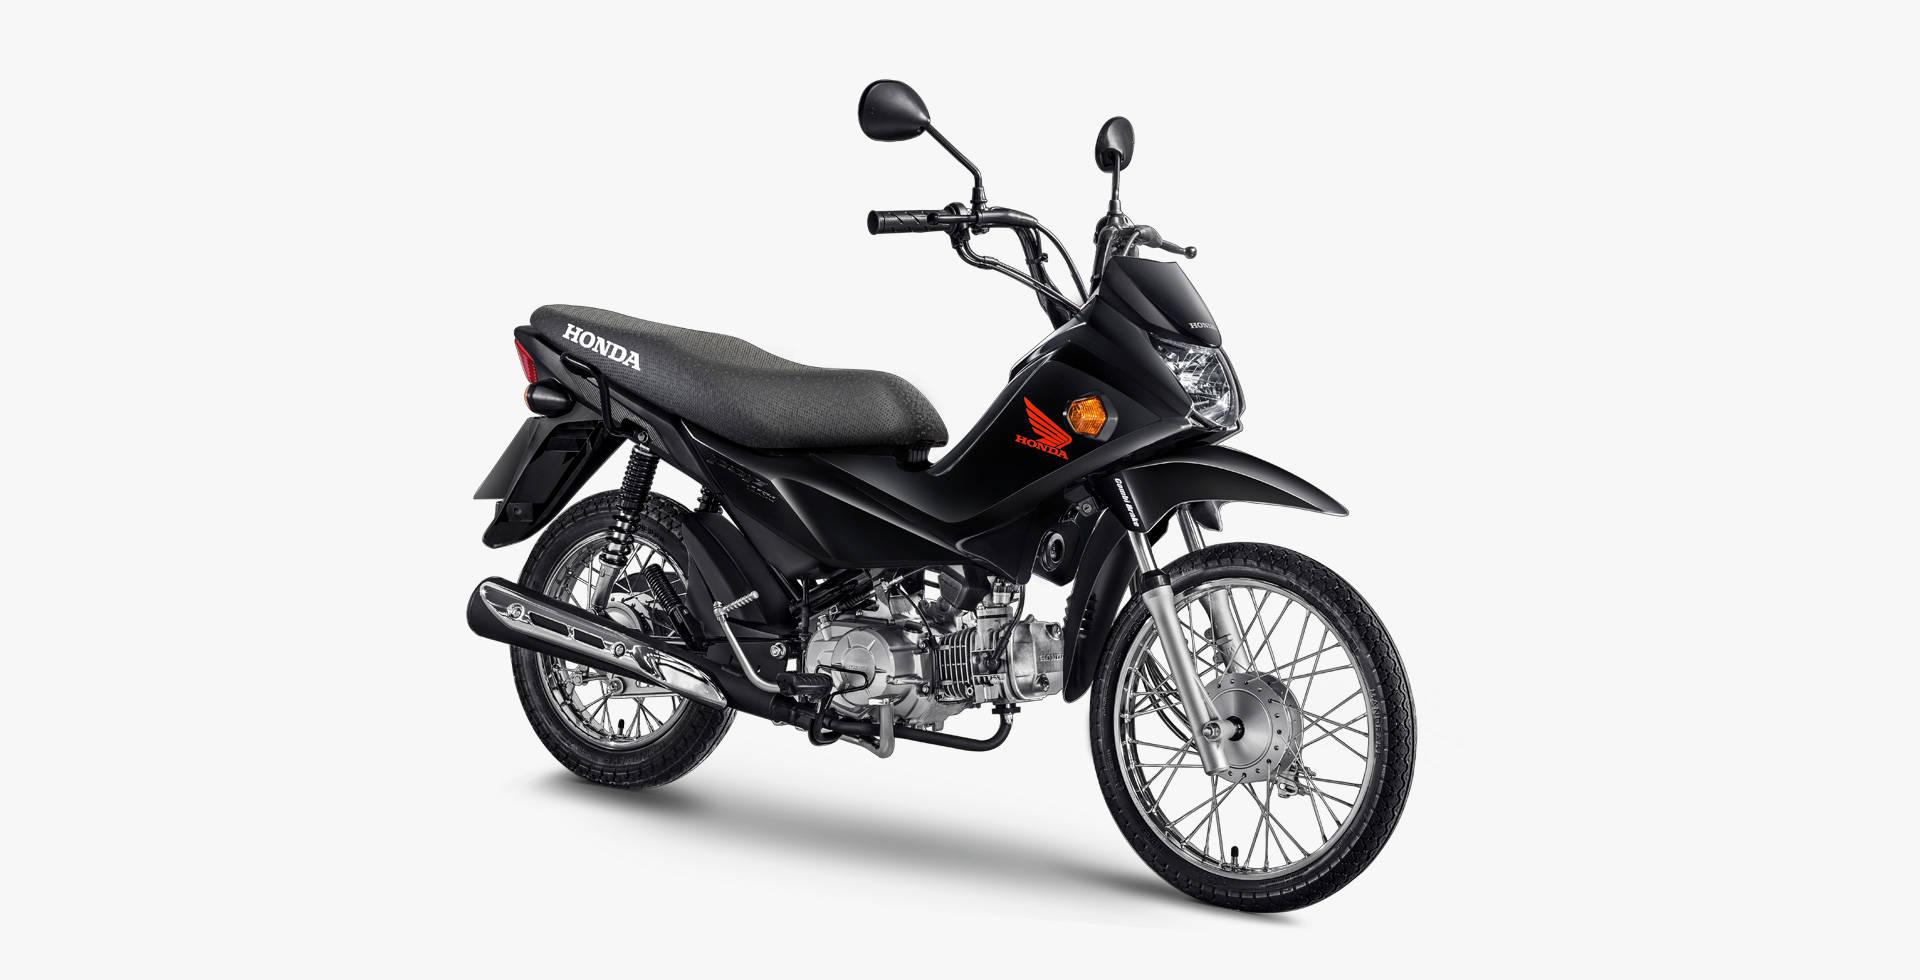 galeria pop110i 3 4 preta - Moto Honda Motopel